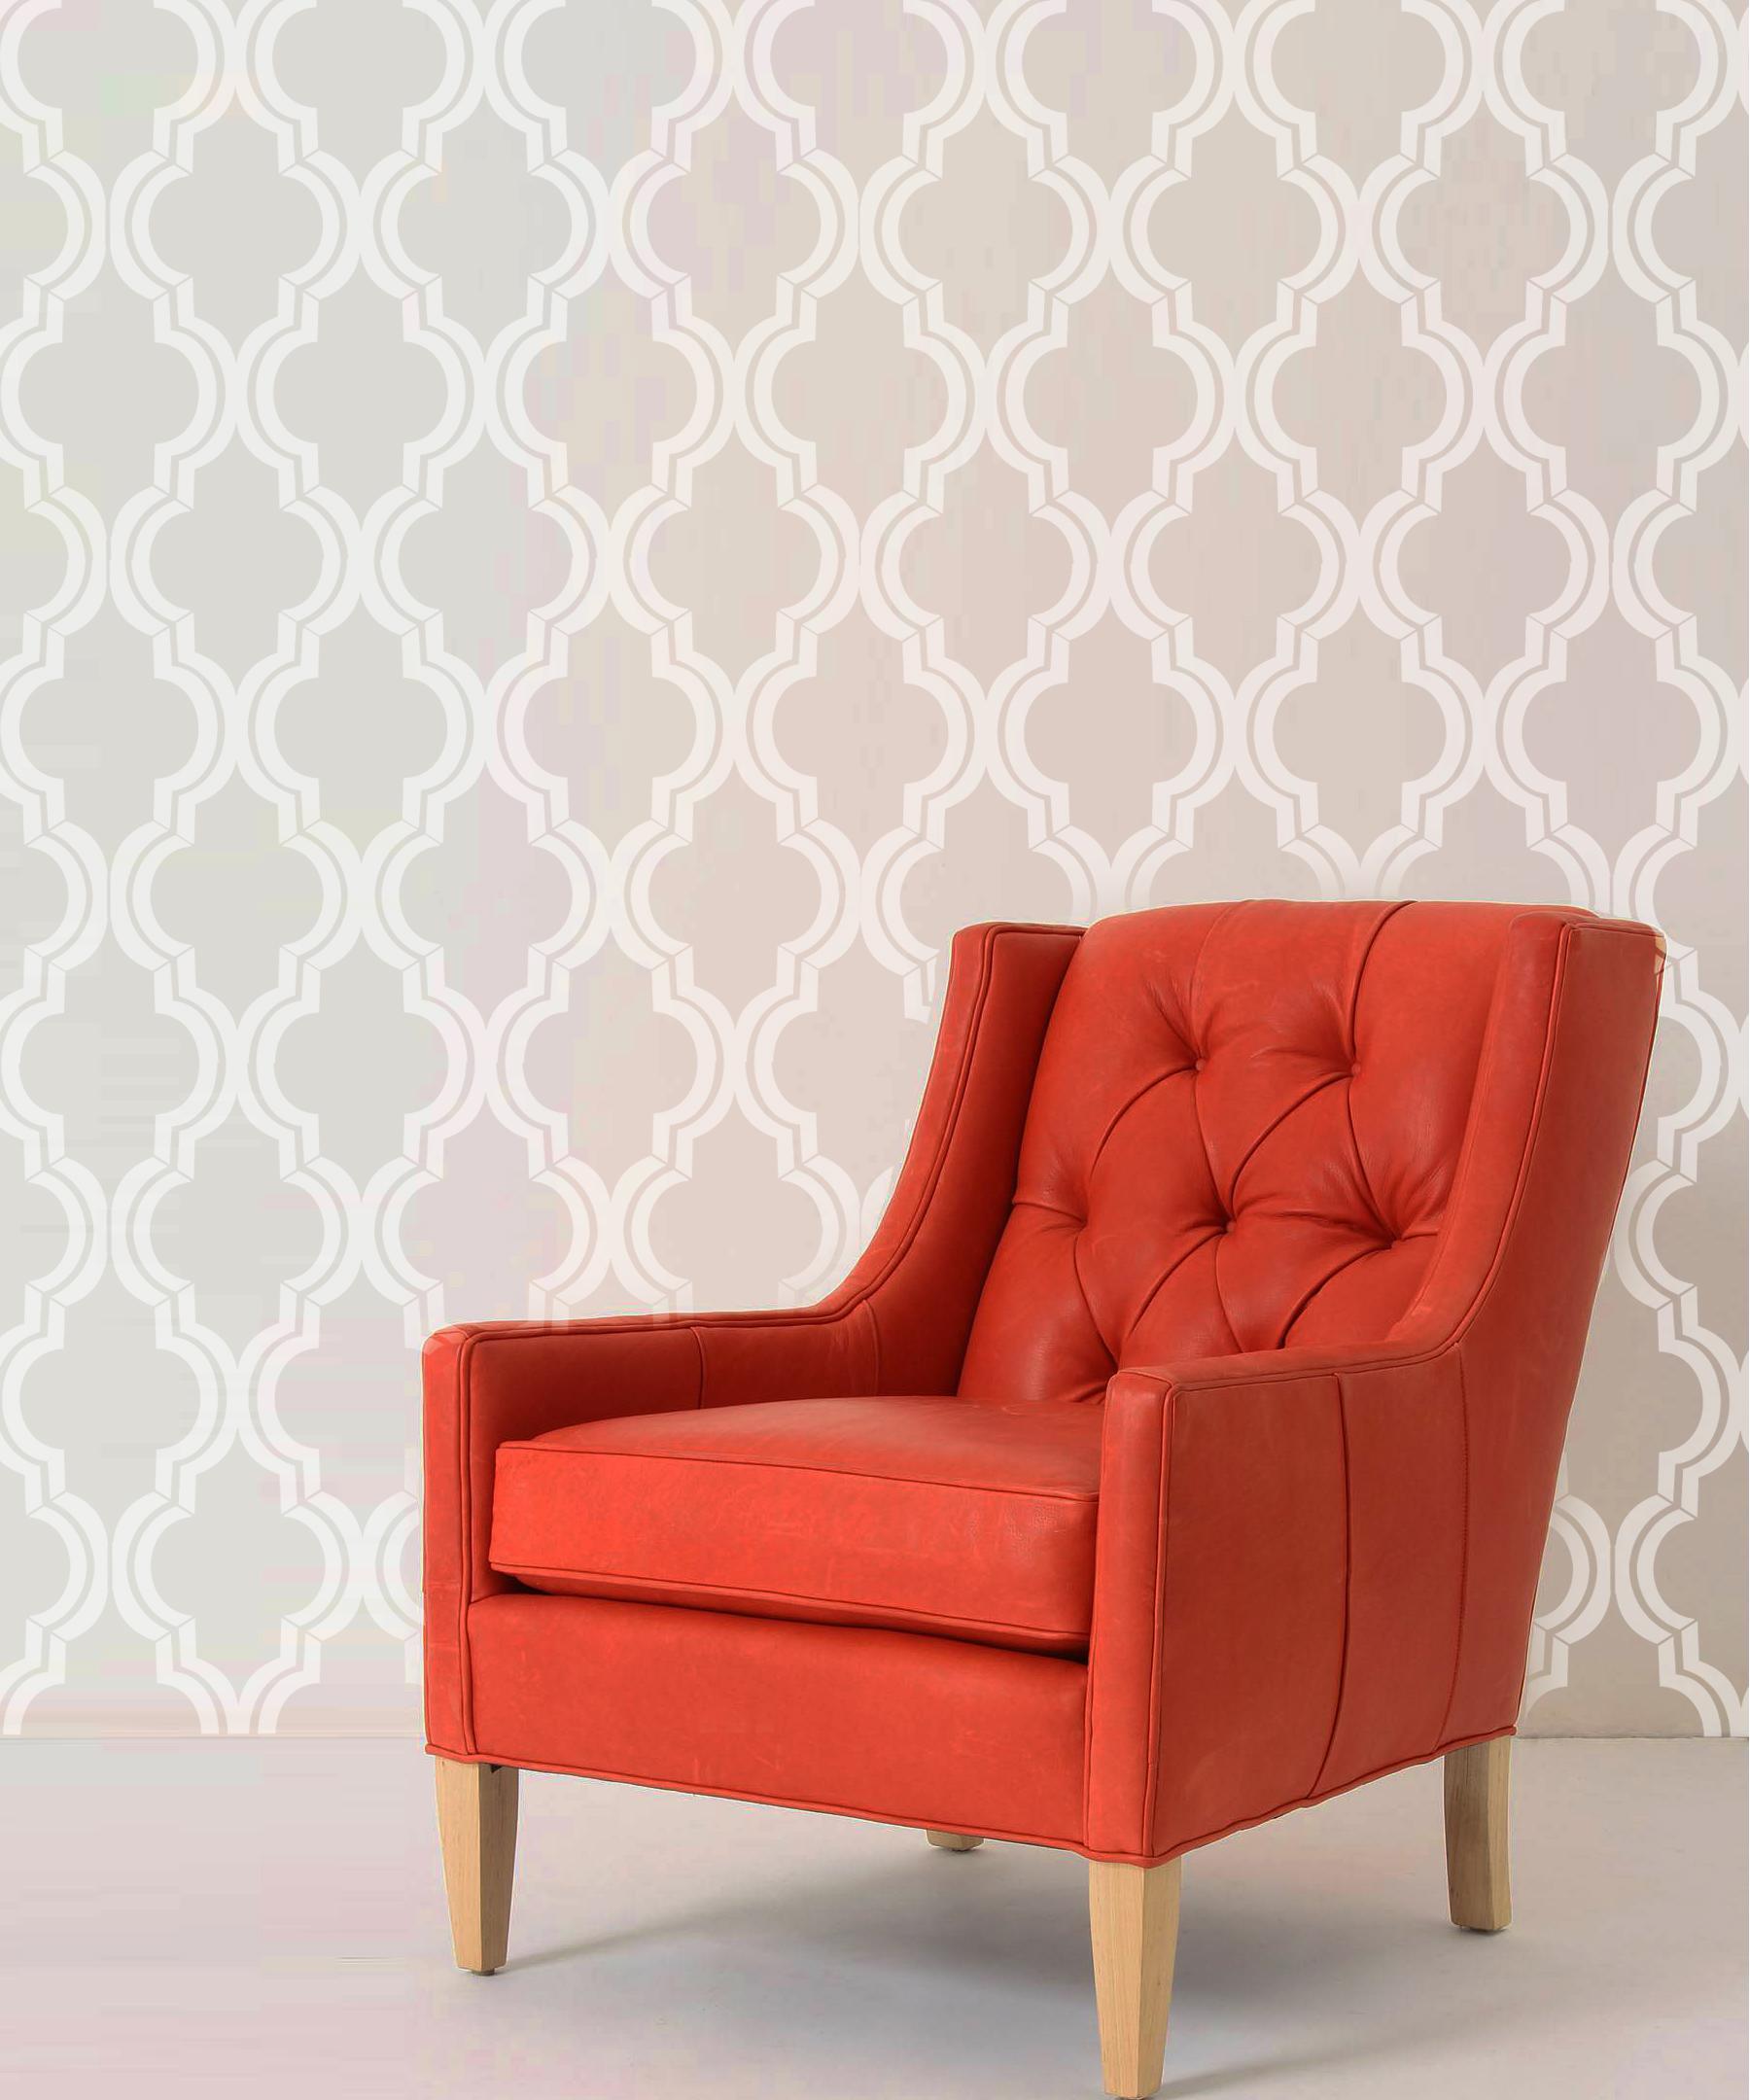 old world allover designer pattern stencil better than wallpaper ...